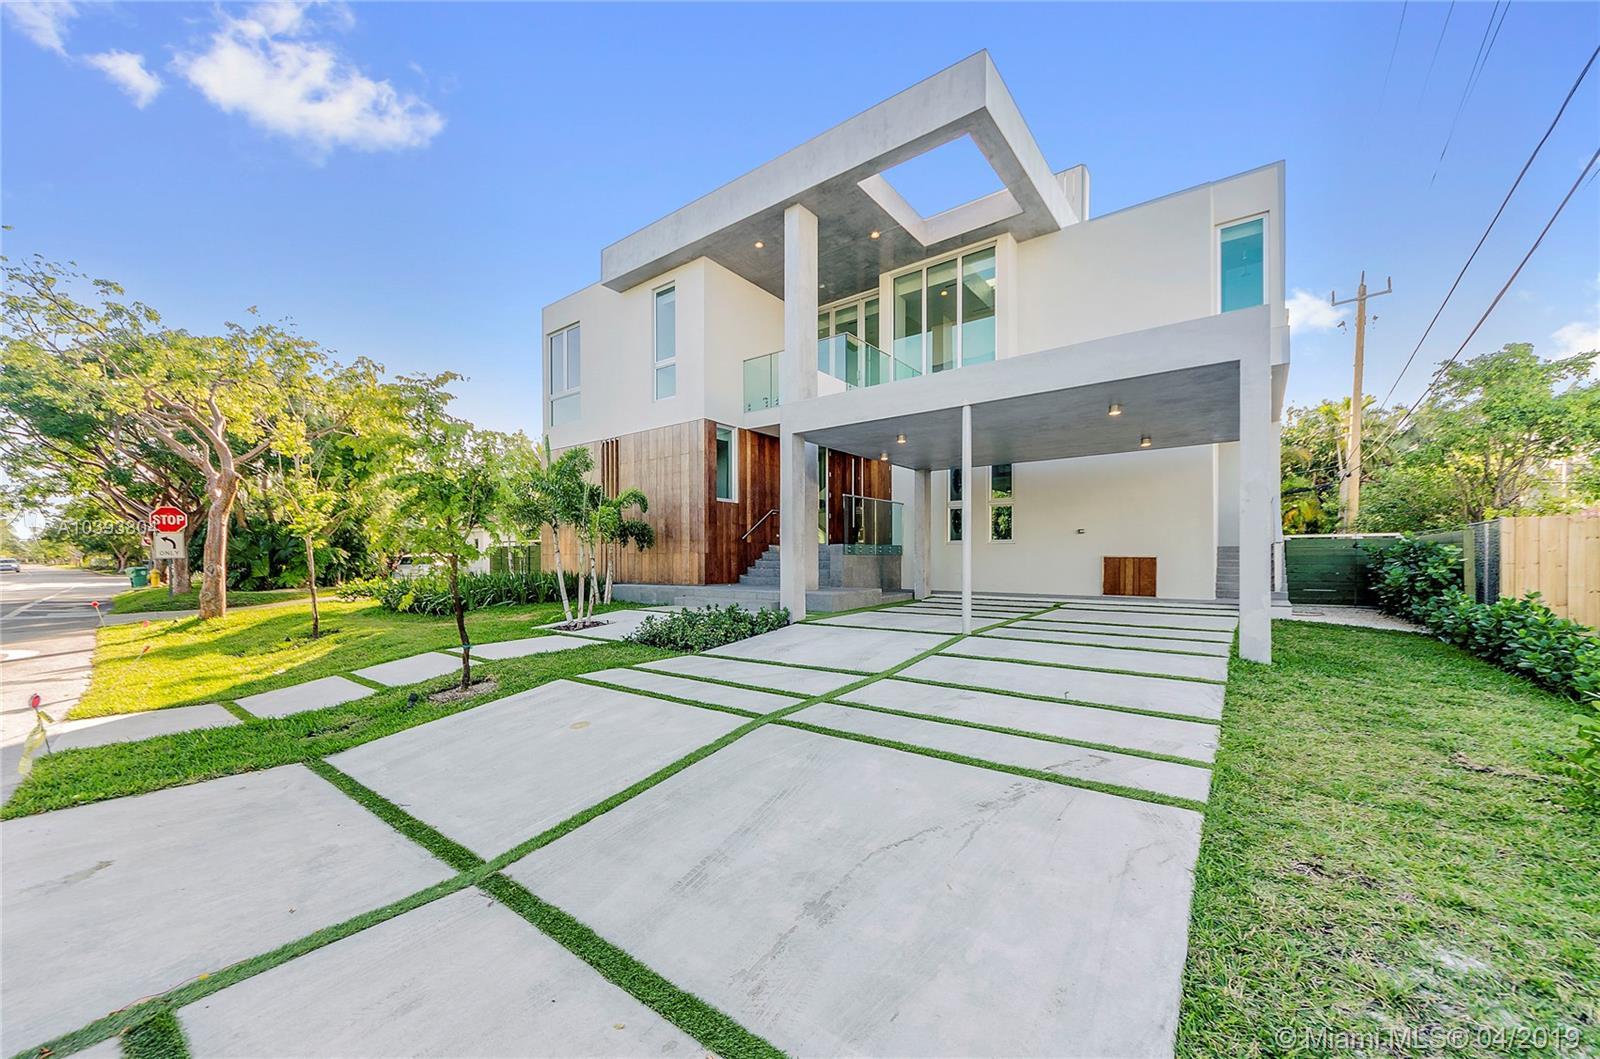 544 Ridgewood Rd, Key Biscayne, Florida